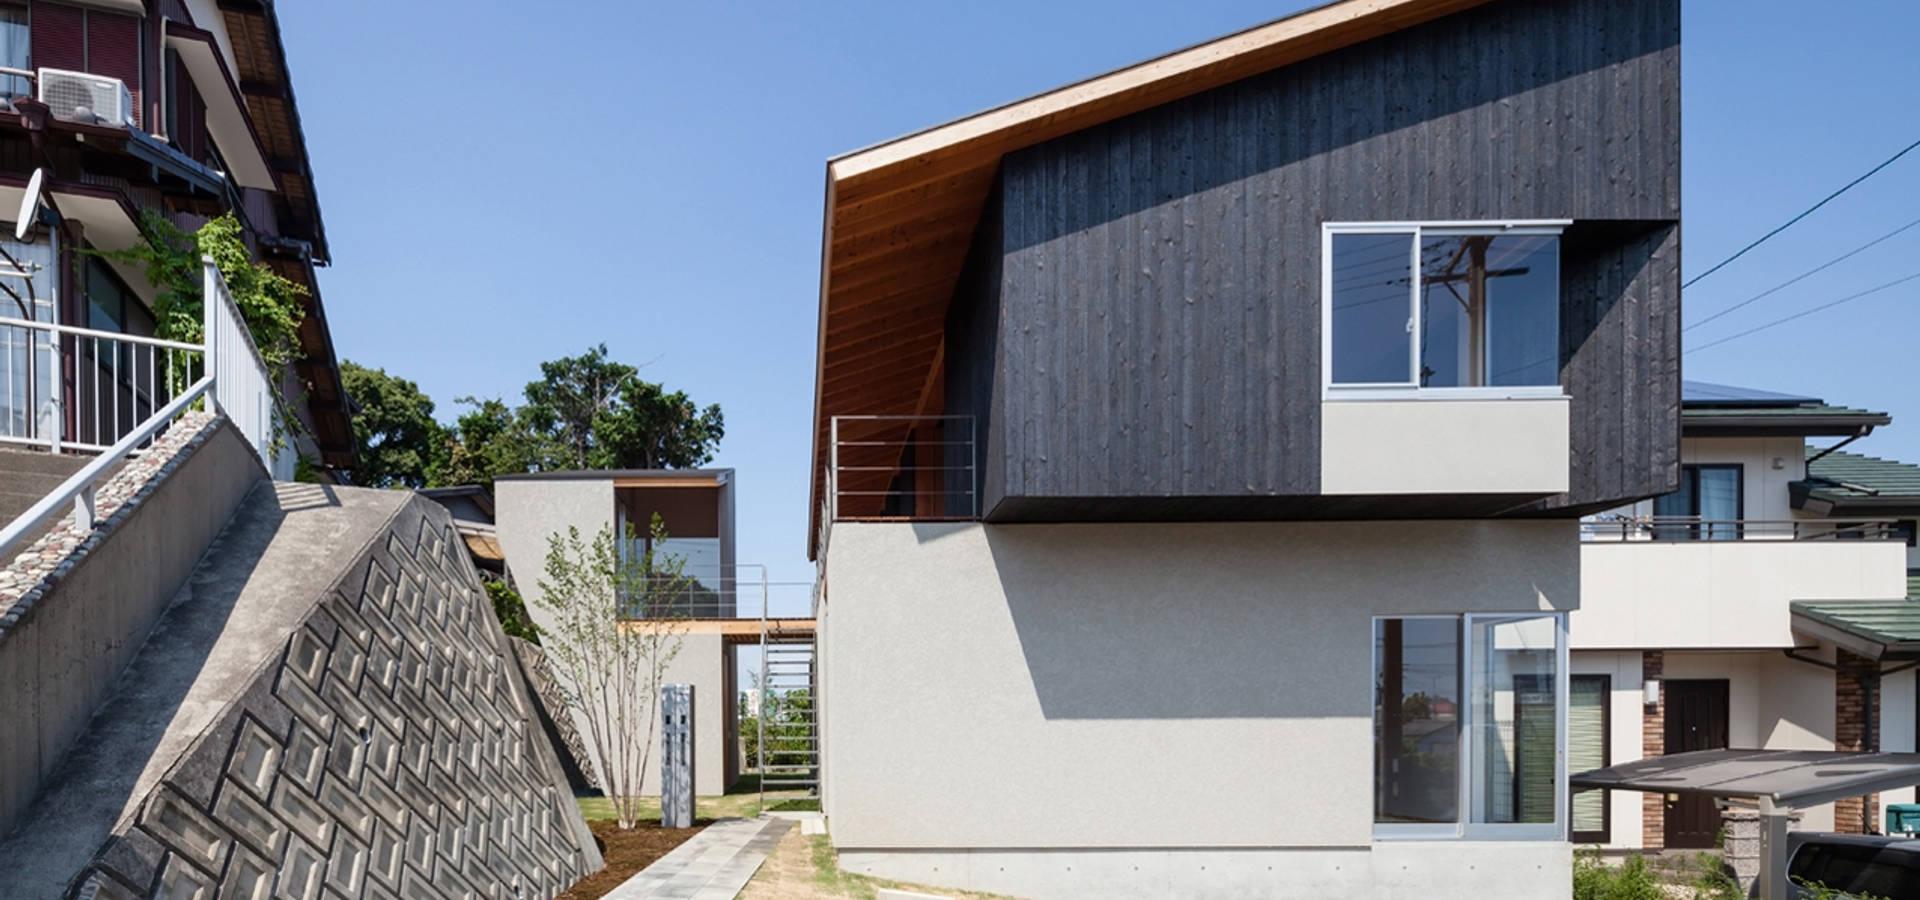 takasago architects